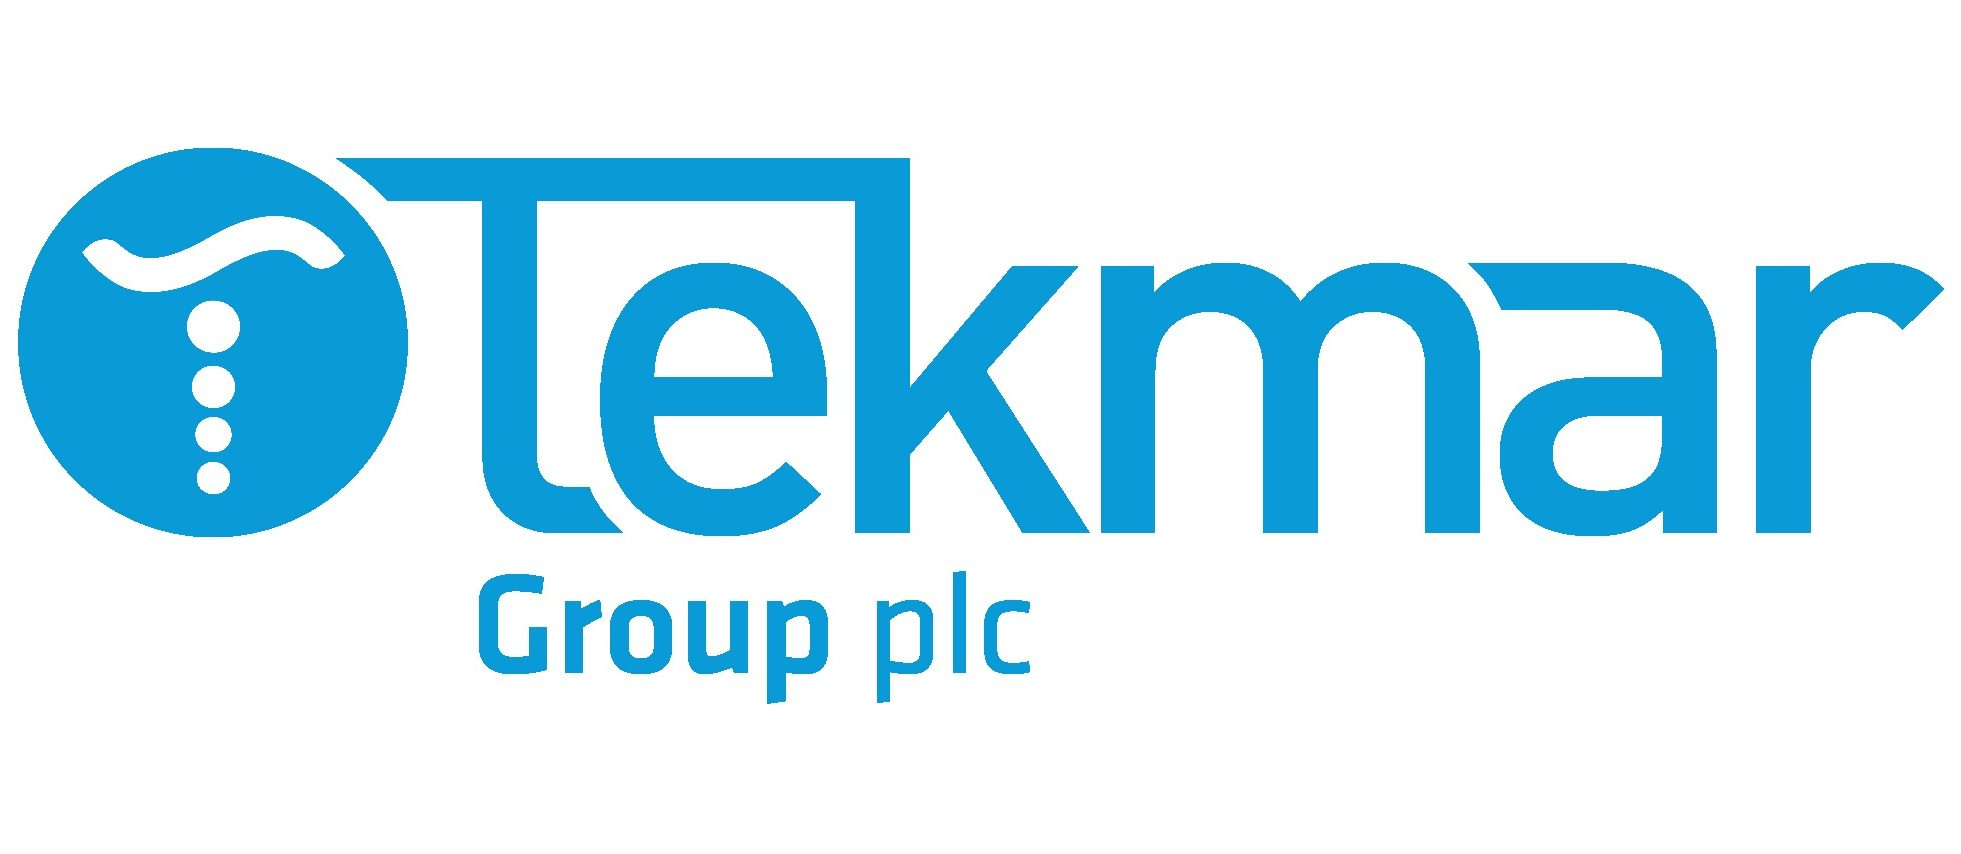 Tekmar Group Plc